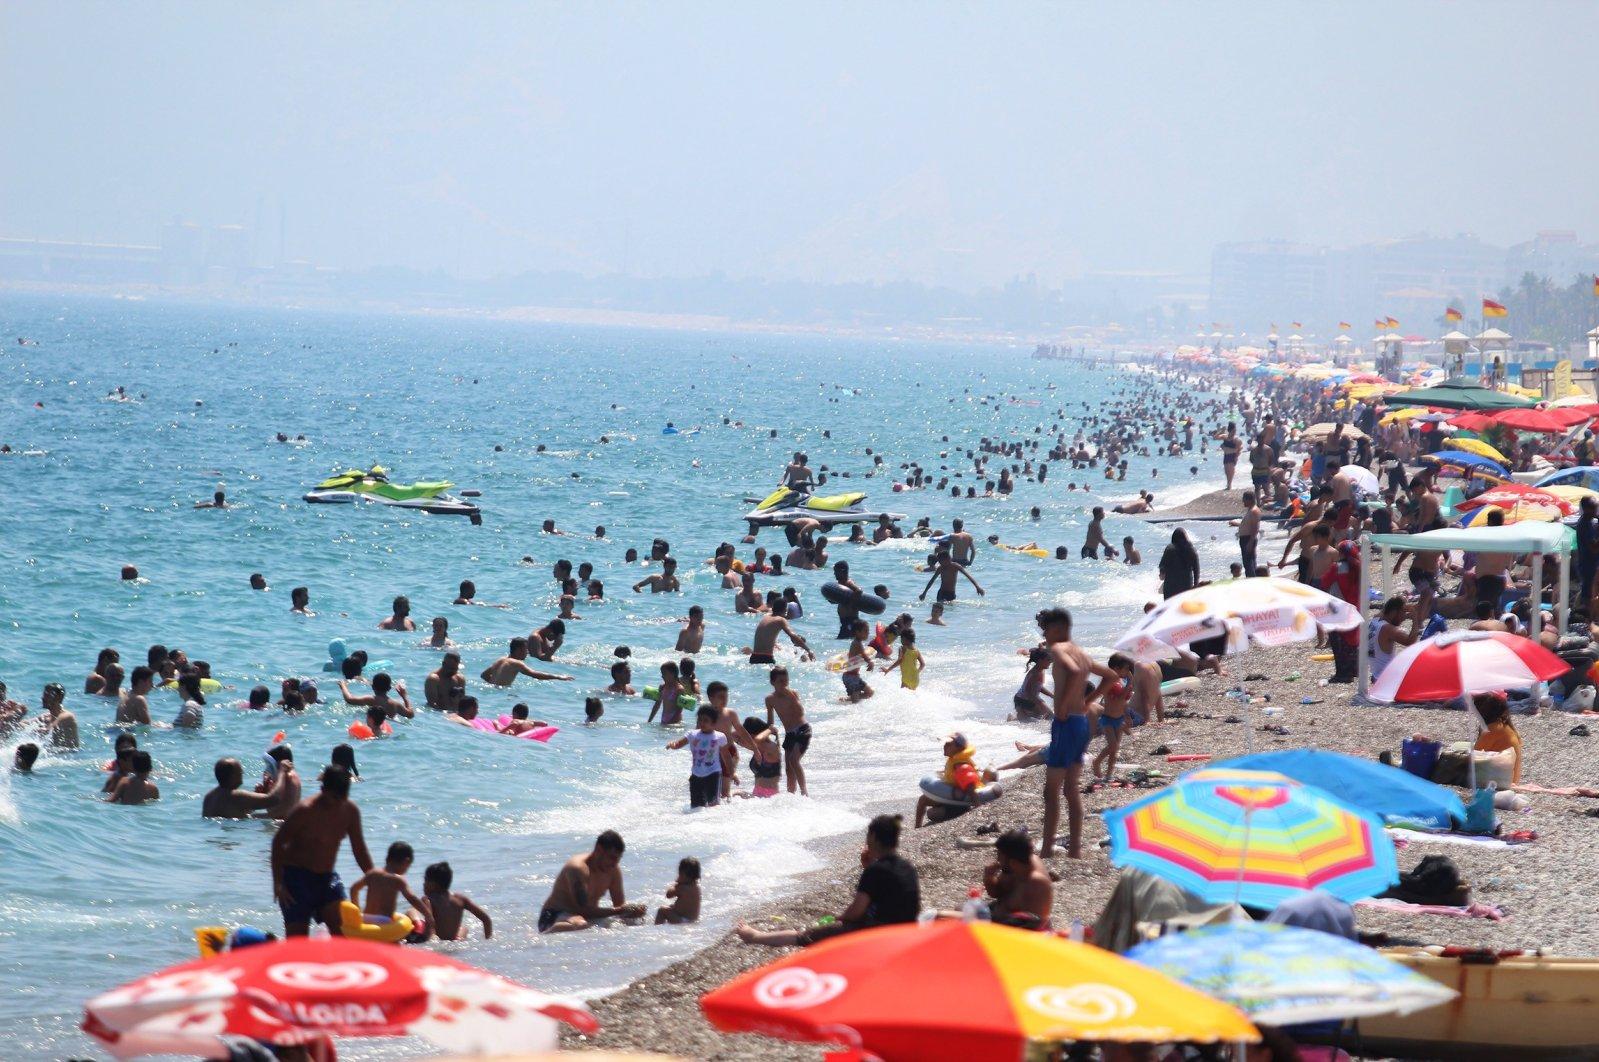 People are seen on Konyaaltı beach, amid the COVID-19 outbreak, in the southern resort city of Antalya, Turkey, July 5, 2020. (IHA Photo)